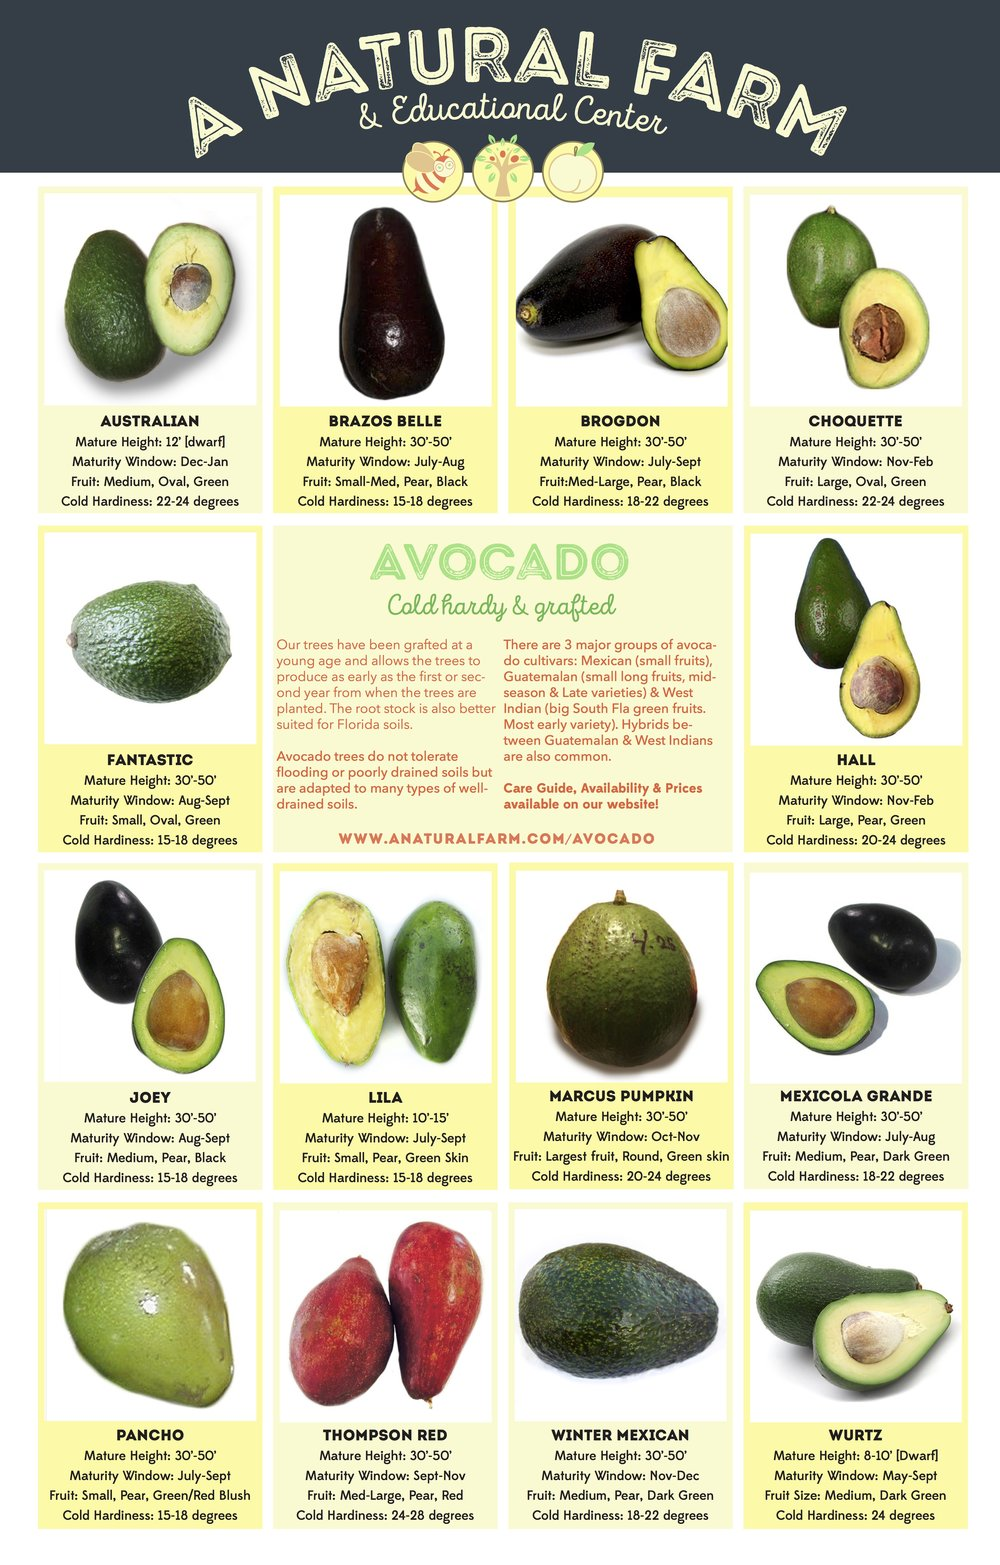 'Marcus Pumpkin' has very high cold tolerance avocado 2 seeds